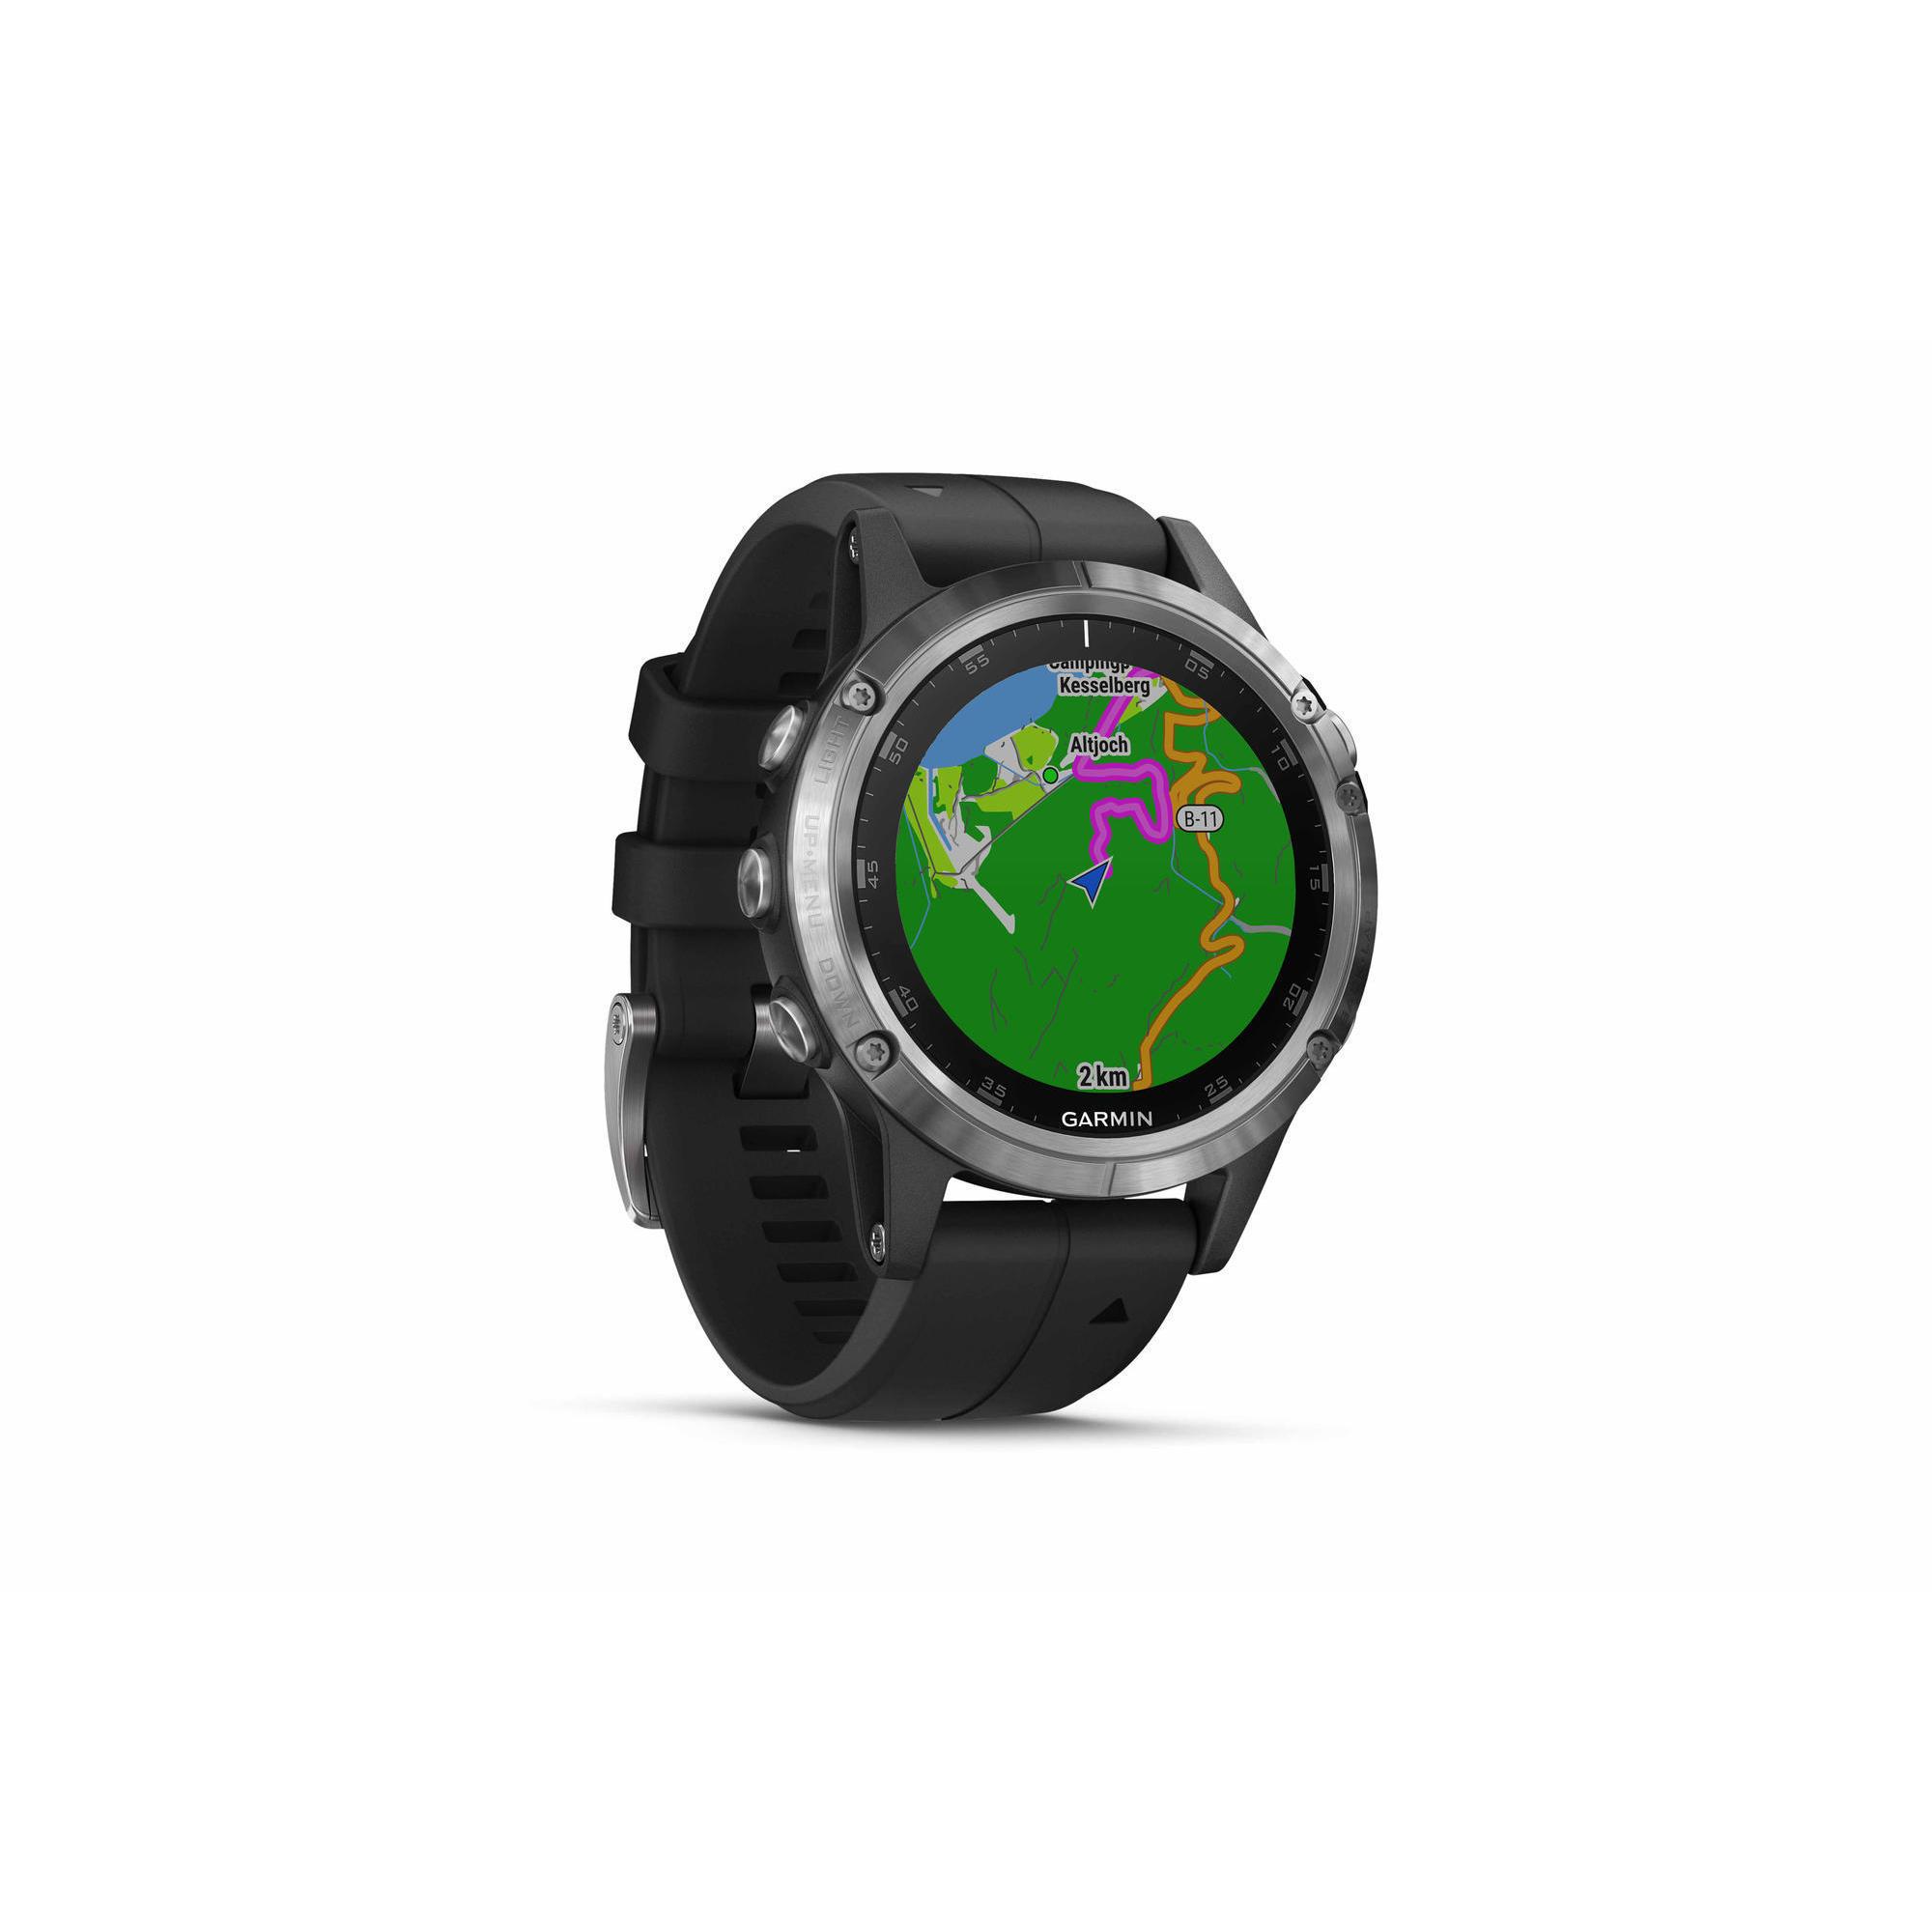 6a028cb9634e Reloj GPS Multideporte Garmin Fénix 5 Plus Silver pulsómetro en muñeca negro